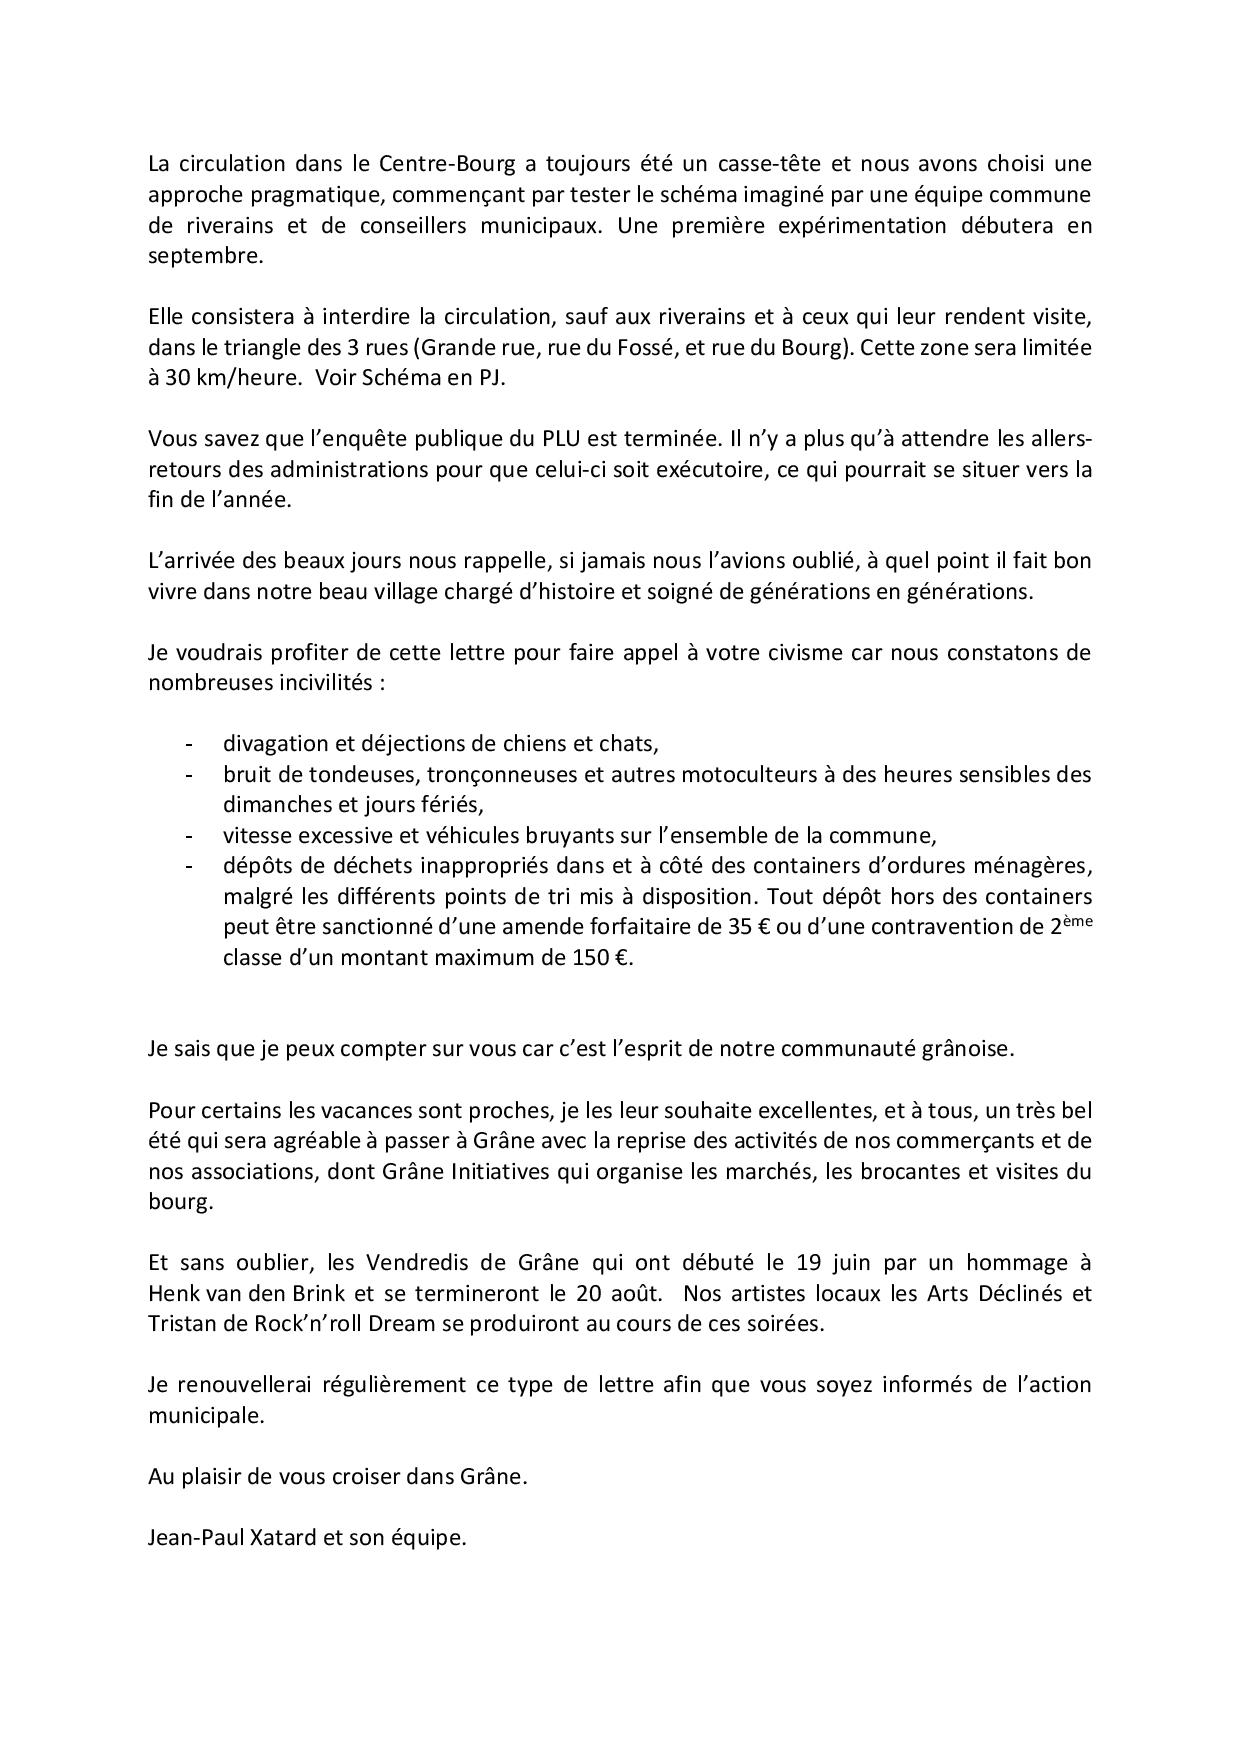 Lettre du Maire juillet 2021_2_-page-002.jpg